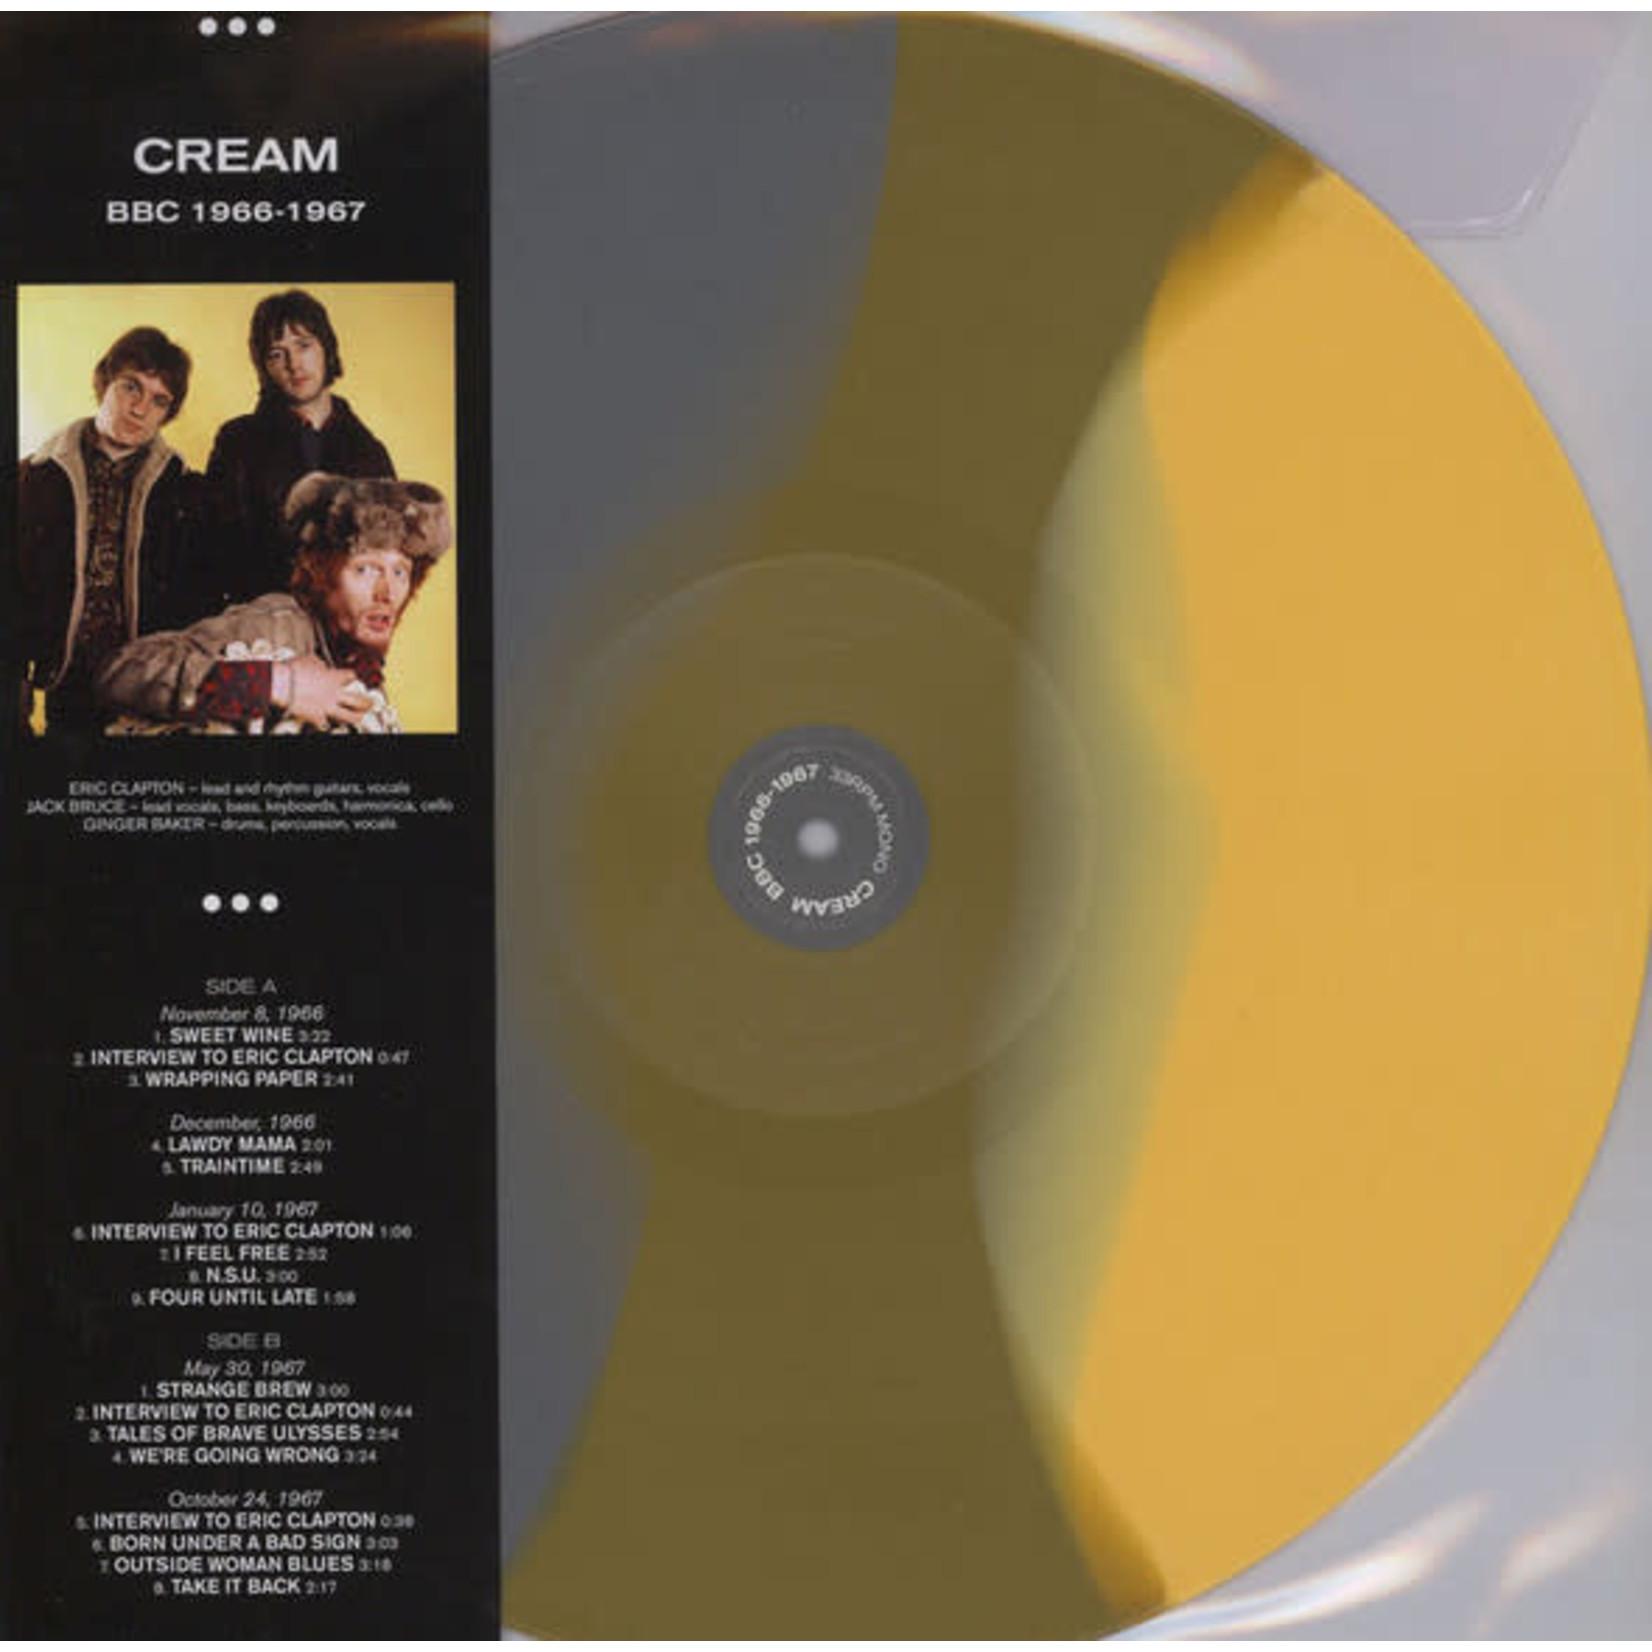 Vinyl Cream - BBC 1966-1967 (Ltd Colour Vinyl). Final Sale